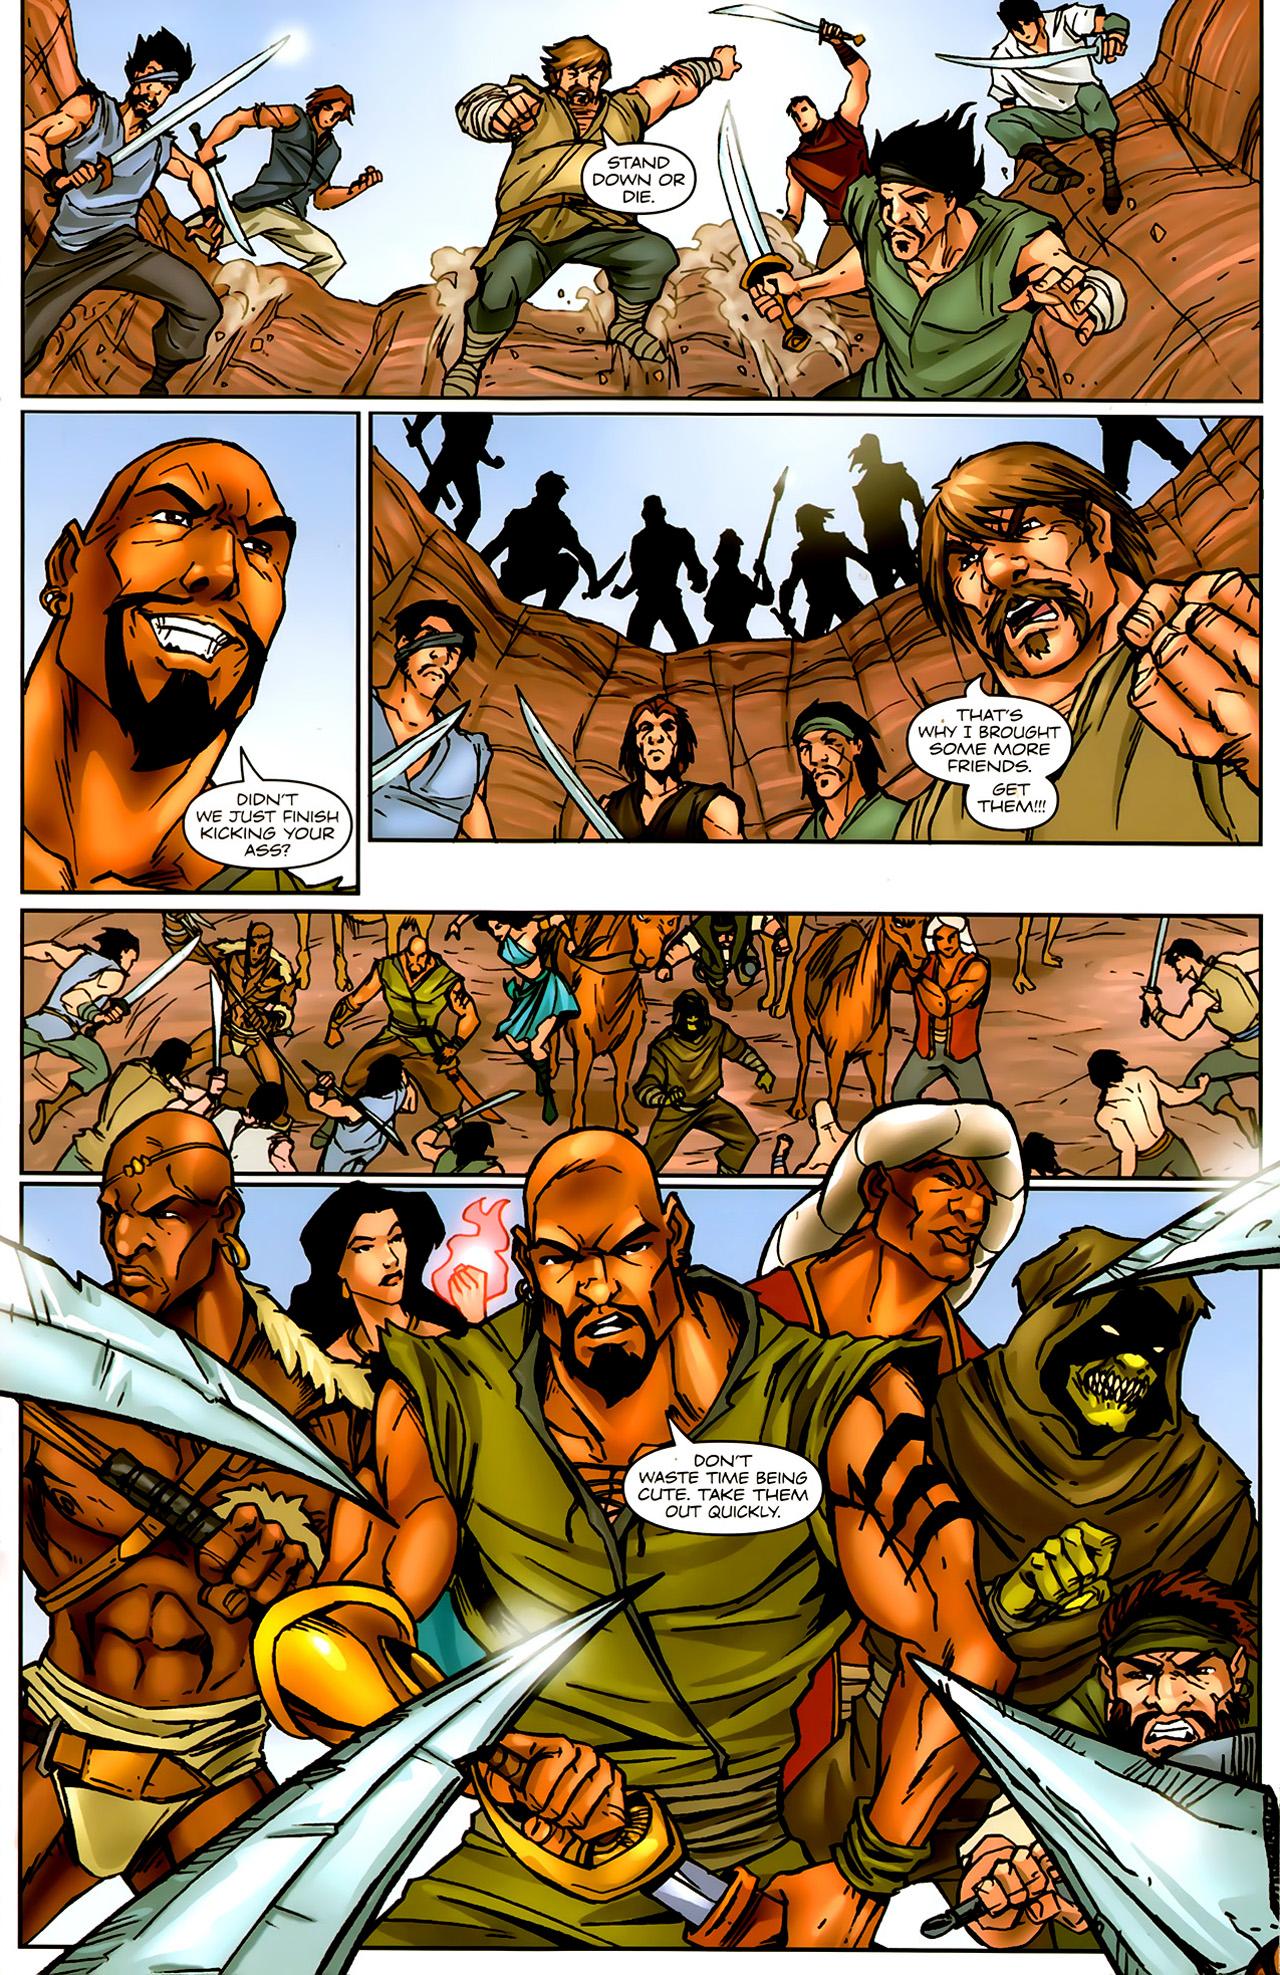 Read online 1001 Arabian Nights: The Adventures of Sinbad comic -  Issue #9 - 15